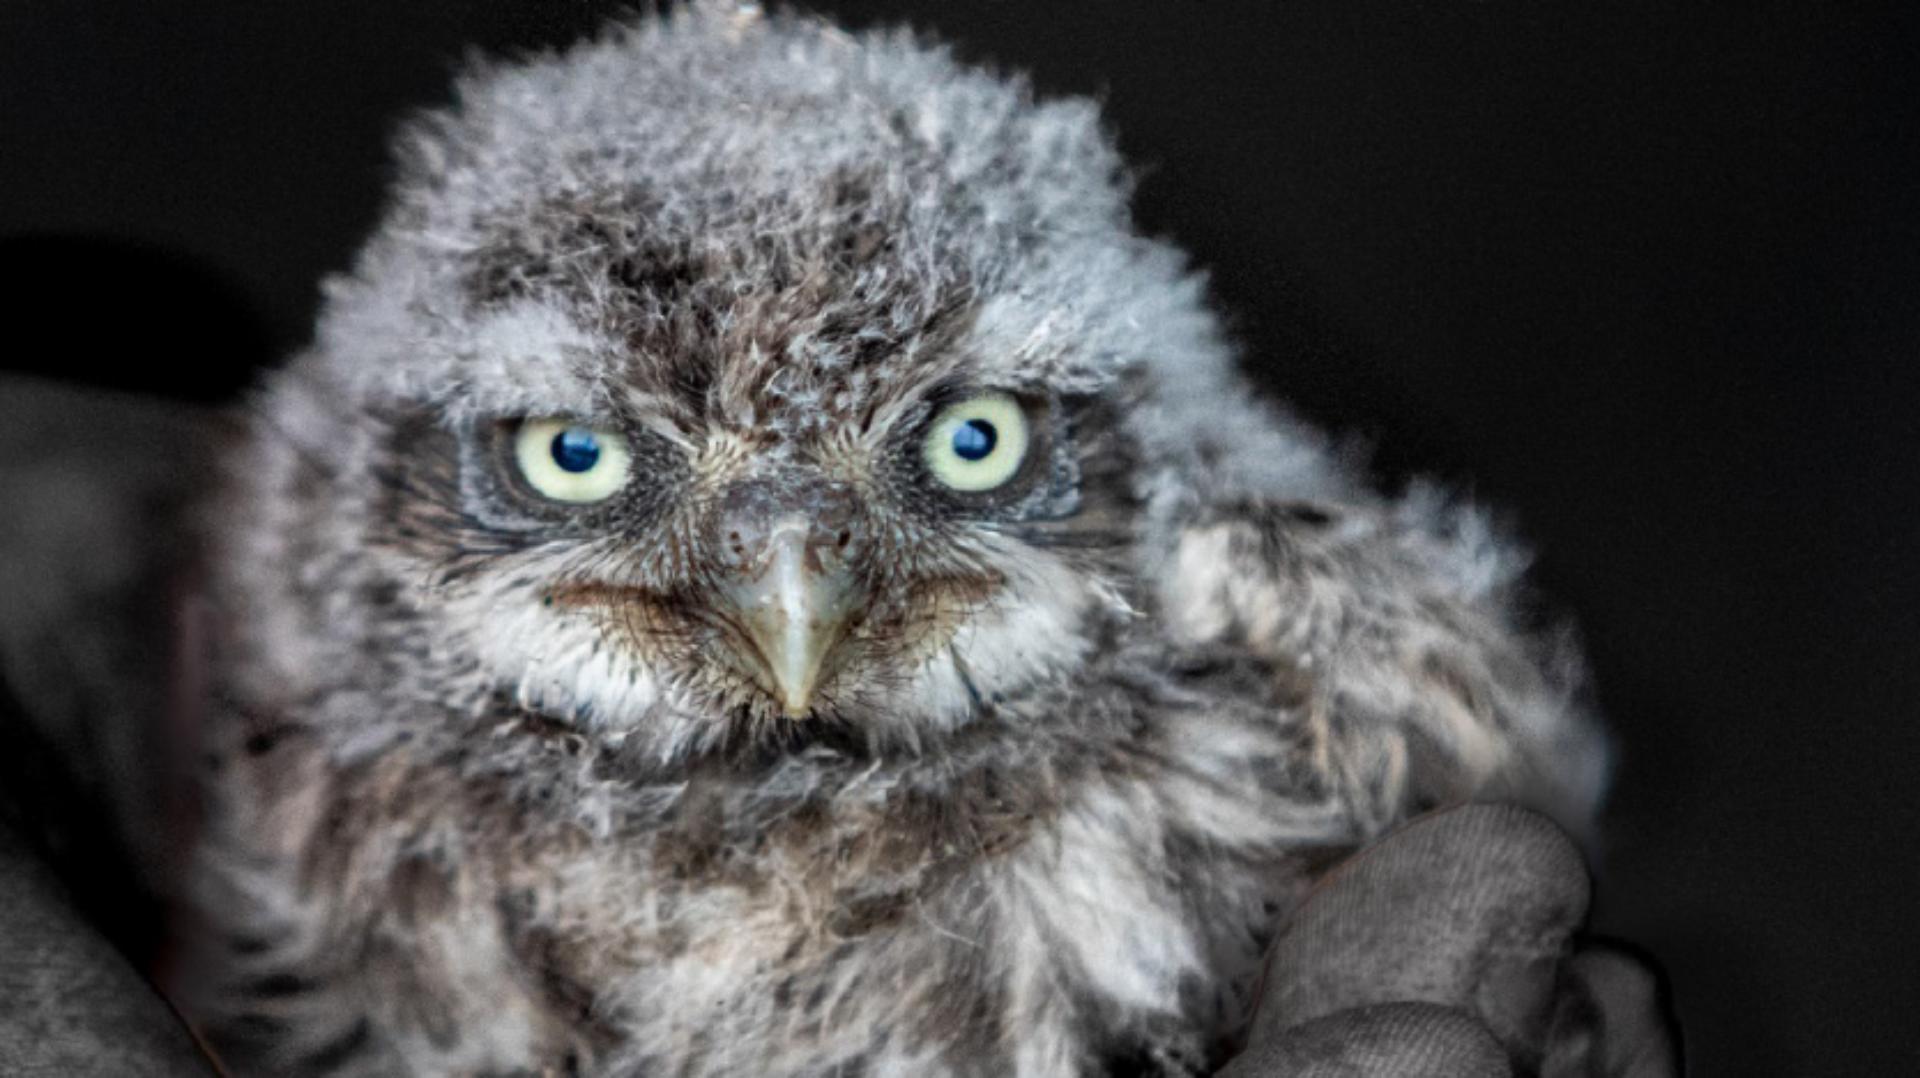 An Owl chick